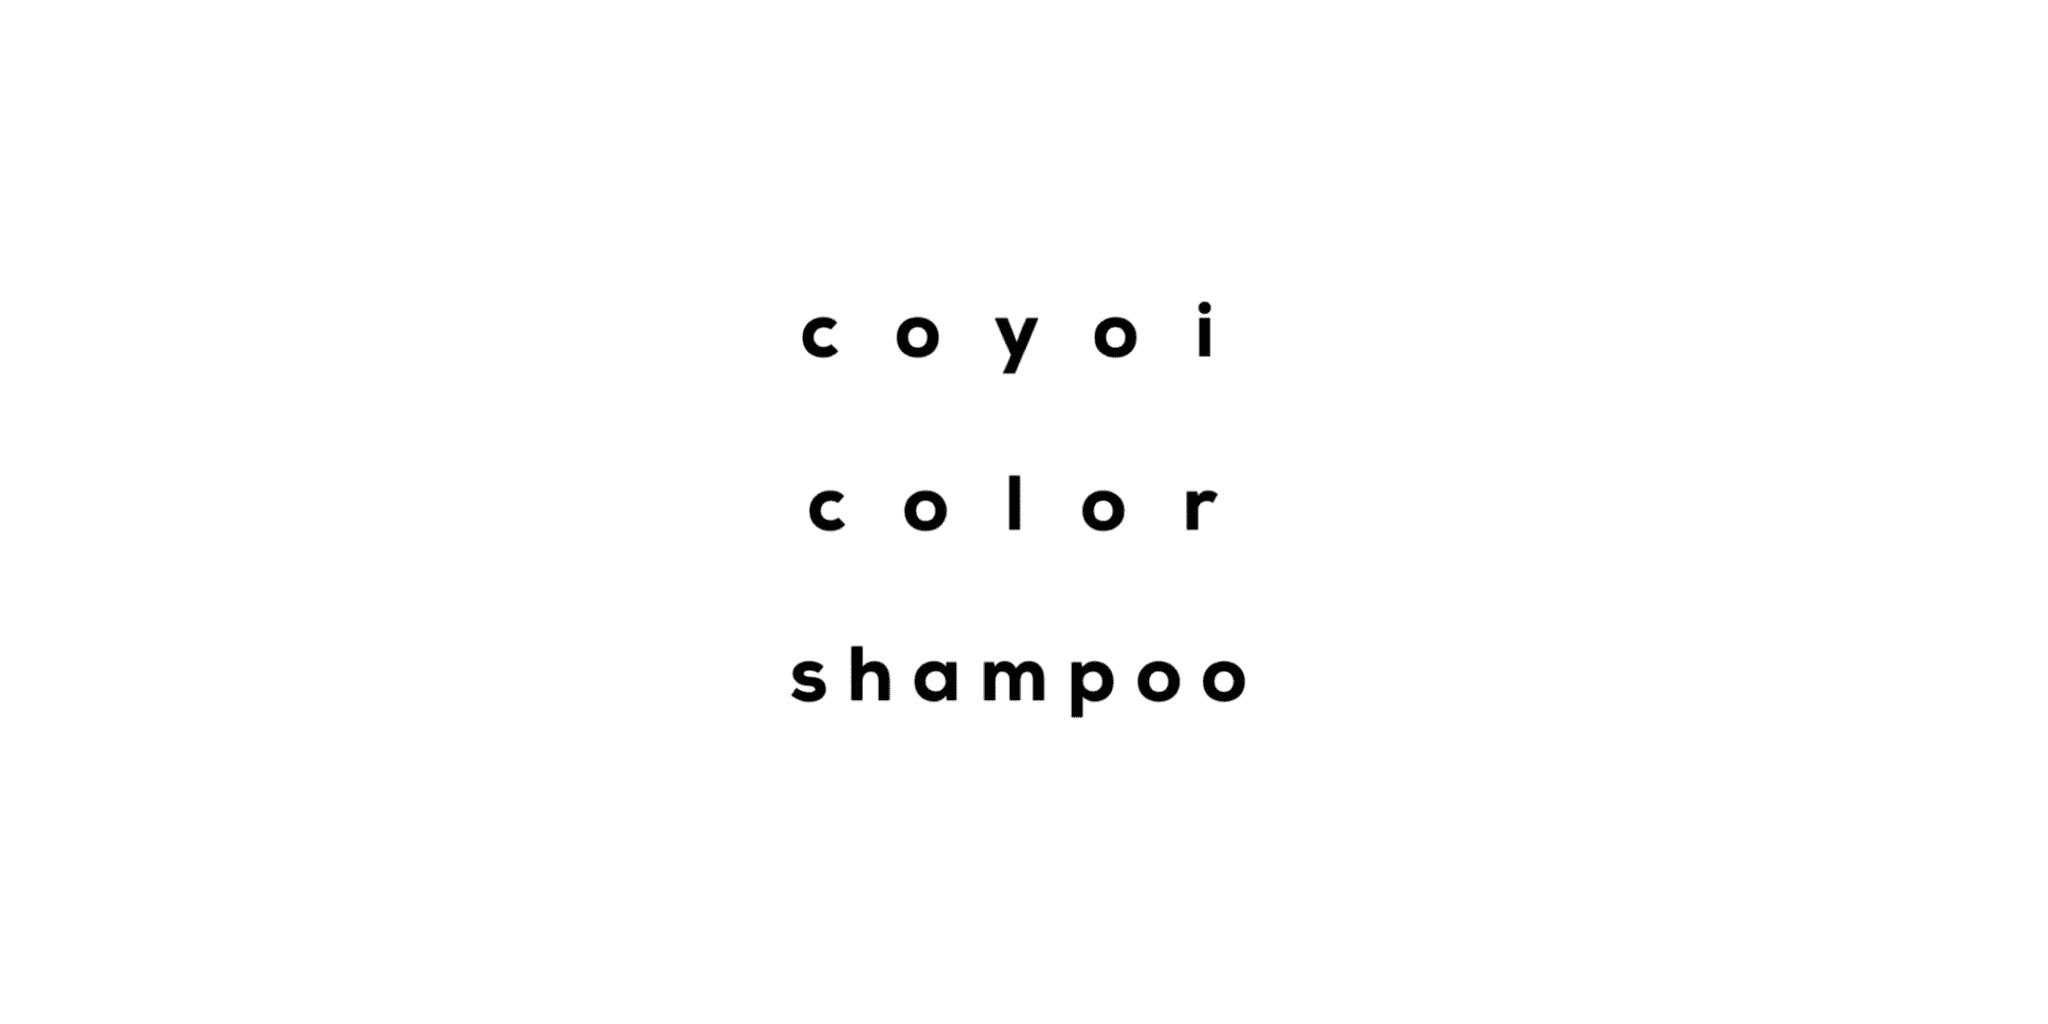 coyoi color shampoo/coyoi color treatment 発売しました!【吉祥寺の美容室coyoi】